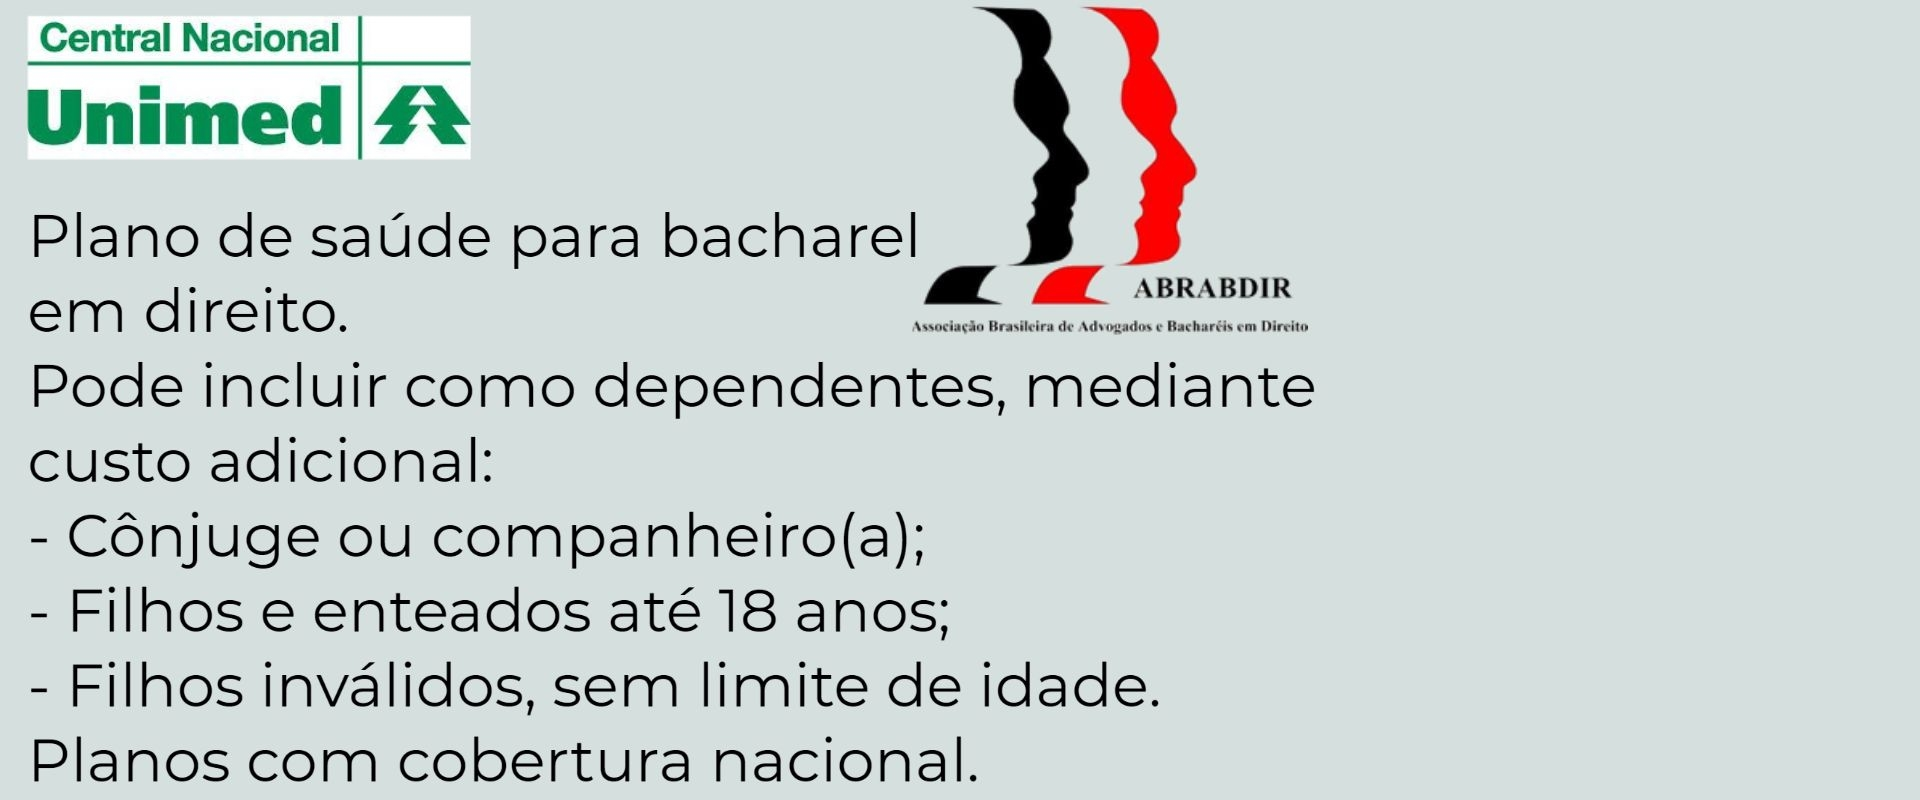 Unimed ABRABDIR Jabuticabal